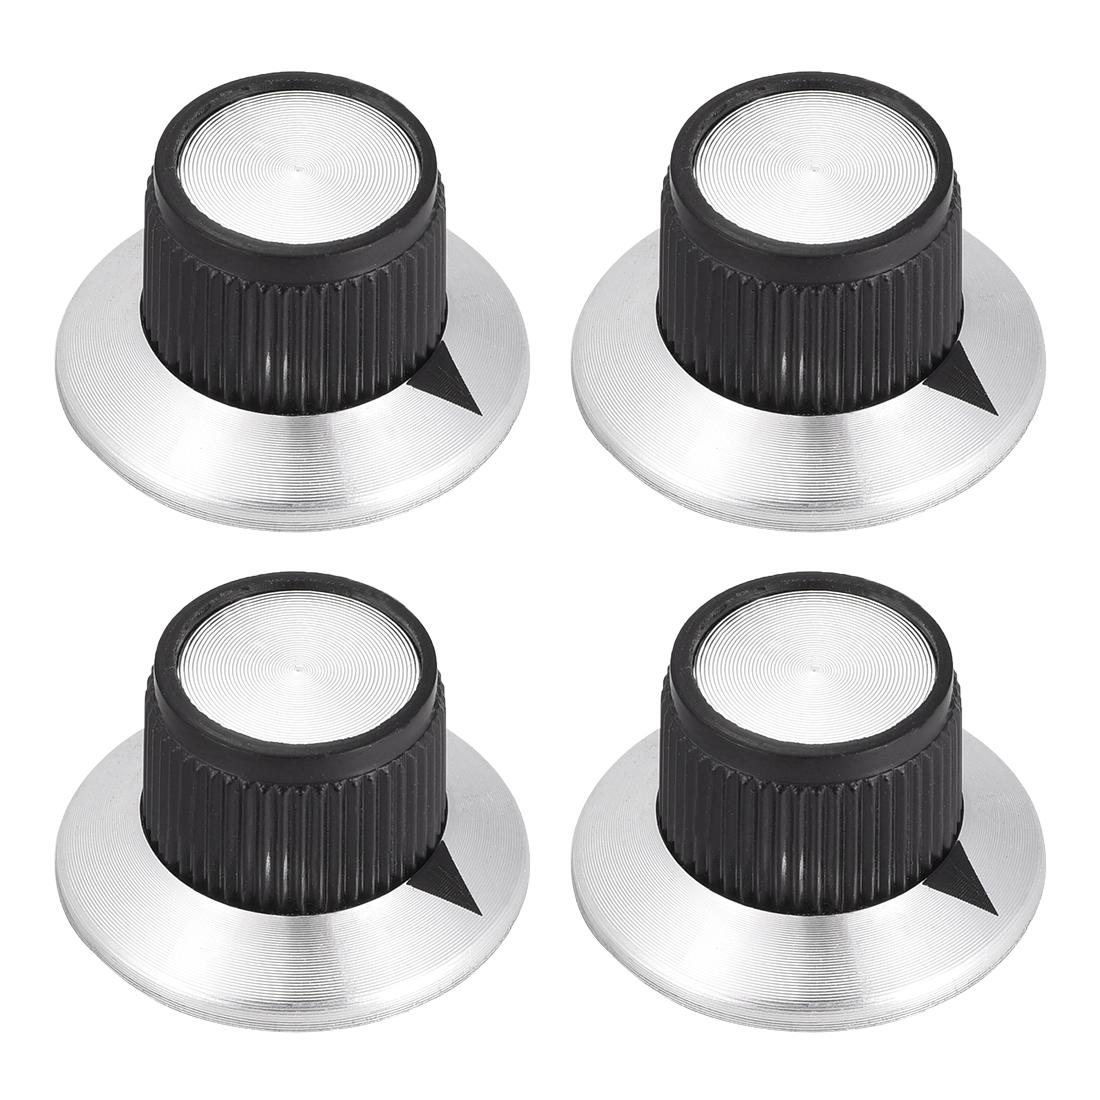 4pcs 6mm Potentiometer Control Knobs For Guitar Volume Tone Black Silver Tone